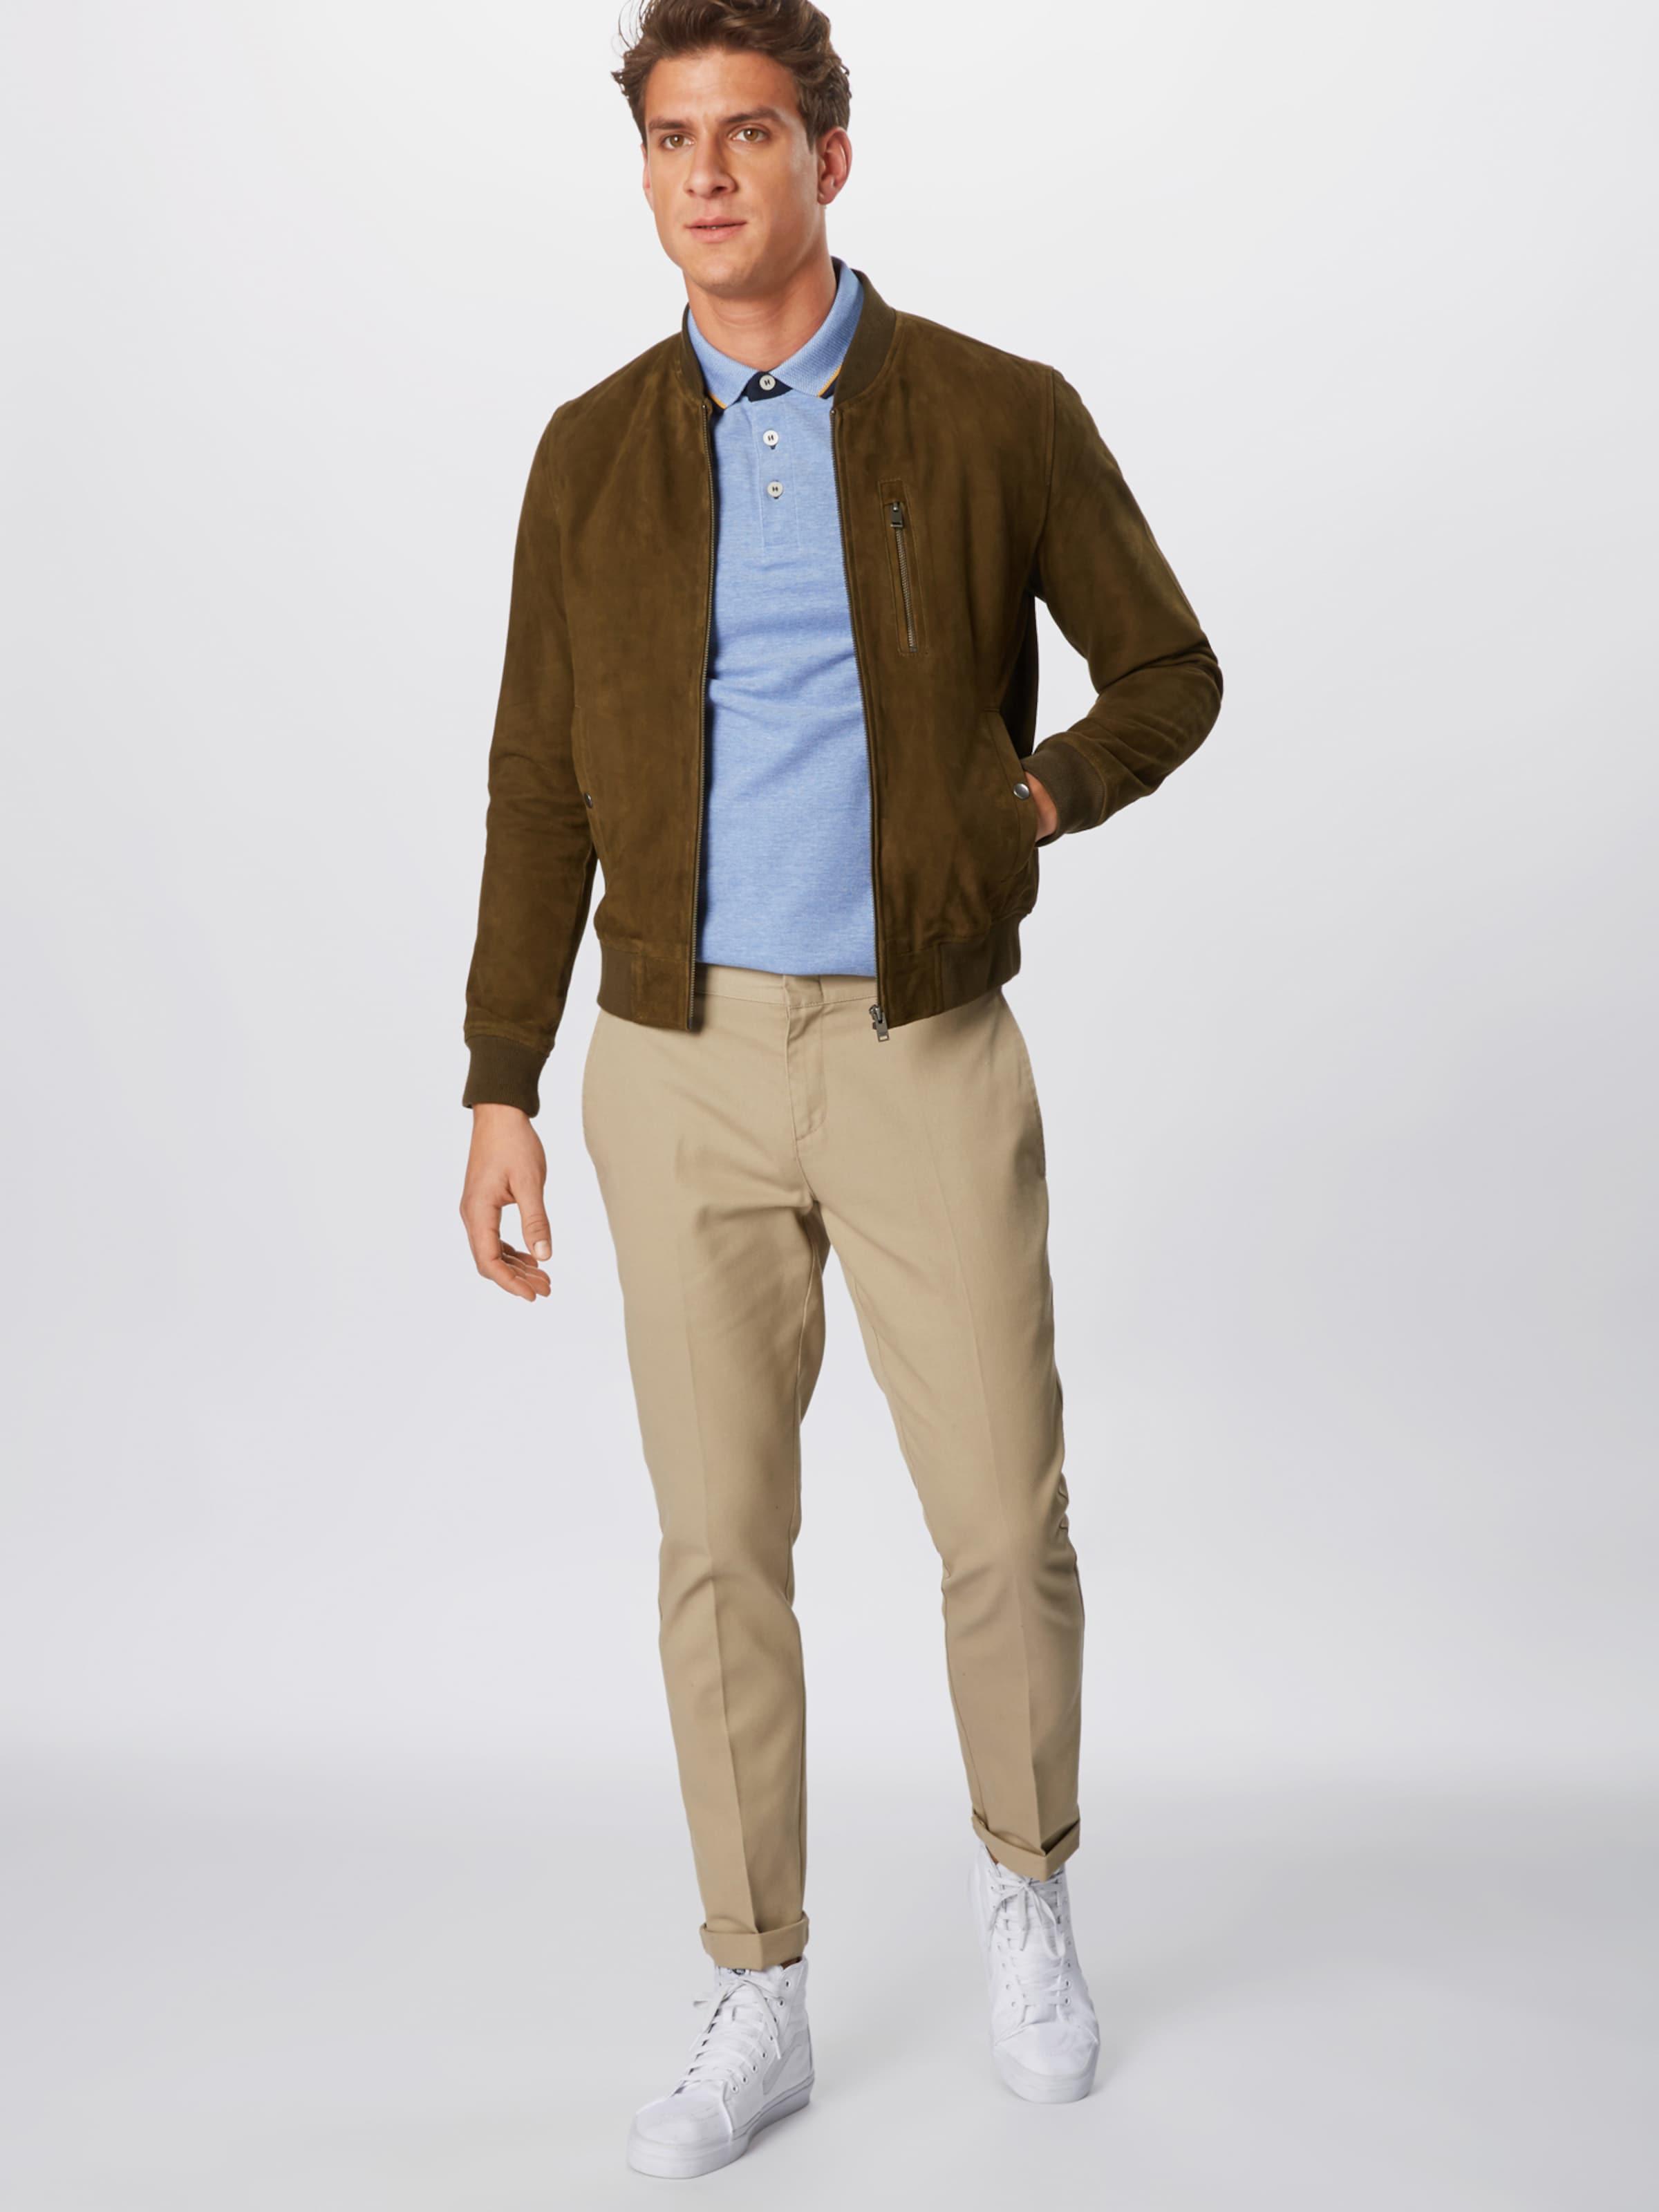 Jones Clair shirt T En Bleu Jackamp; 'paulos' rQeWdBCxo